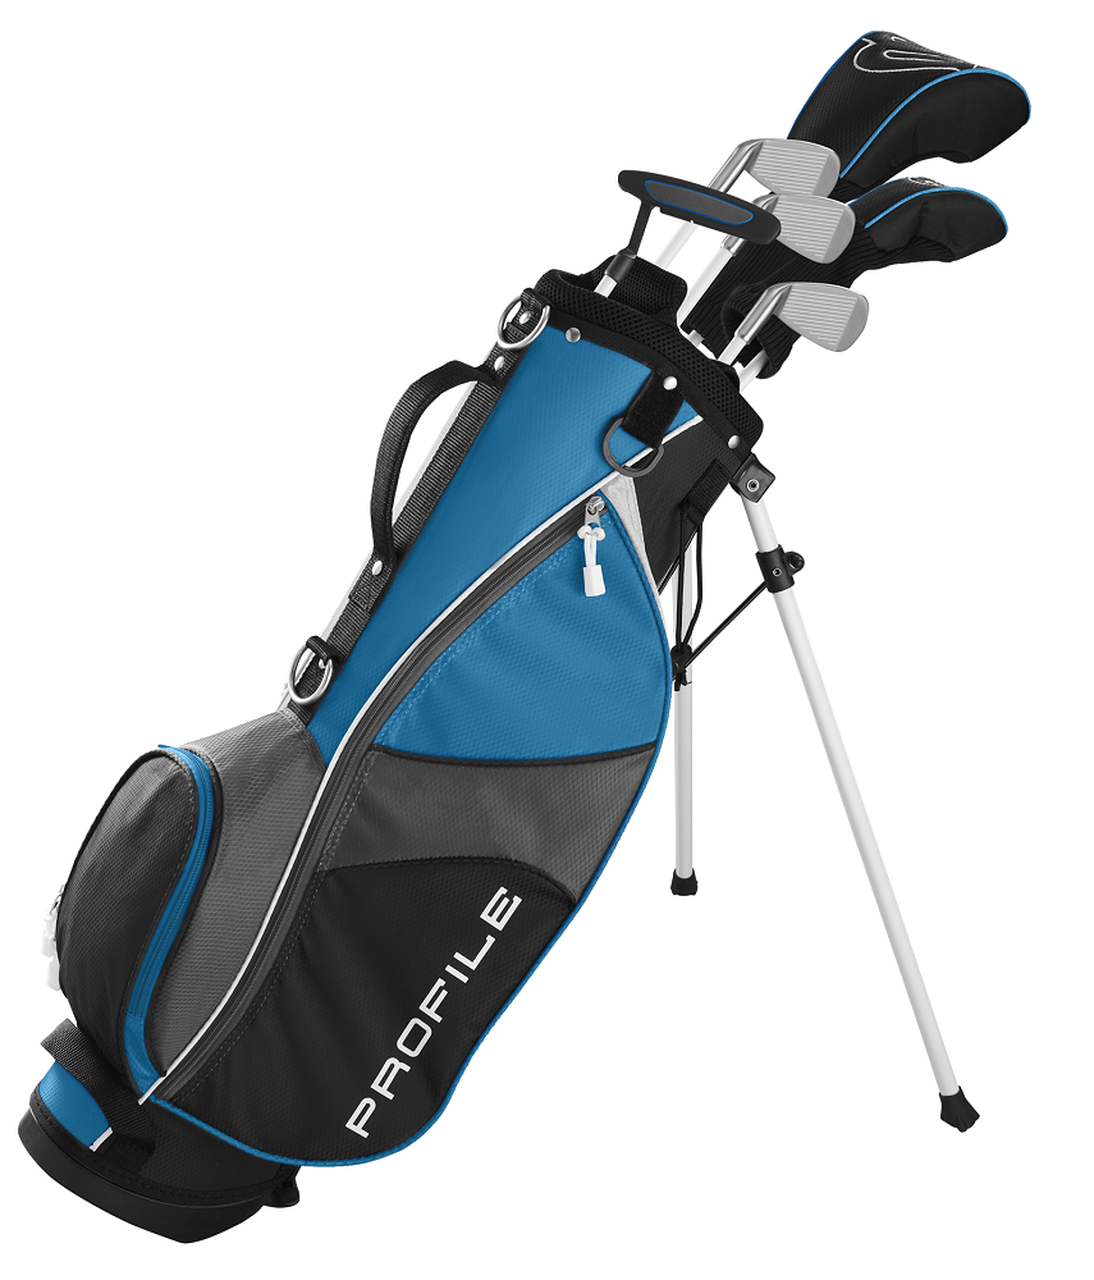 Wilson Profile Sgi Junior Large Complete Set W Bag Rockbottomgolf Com